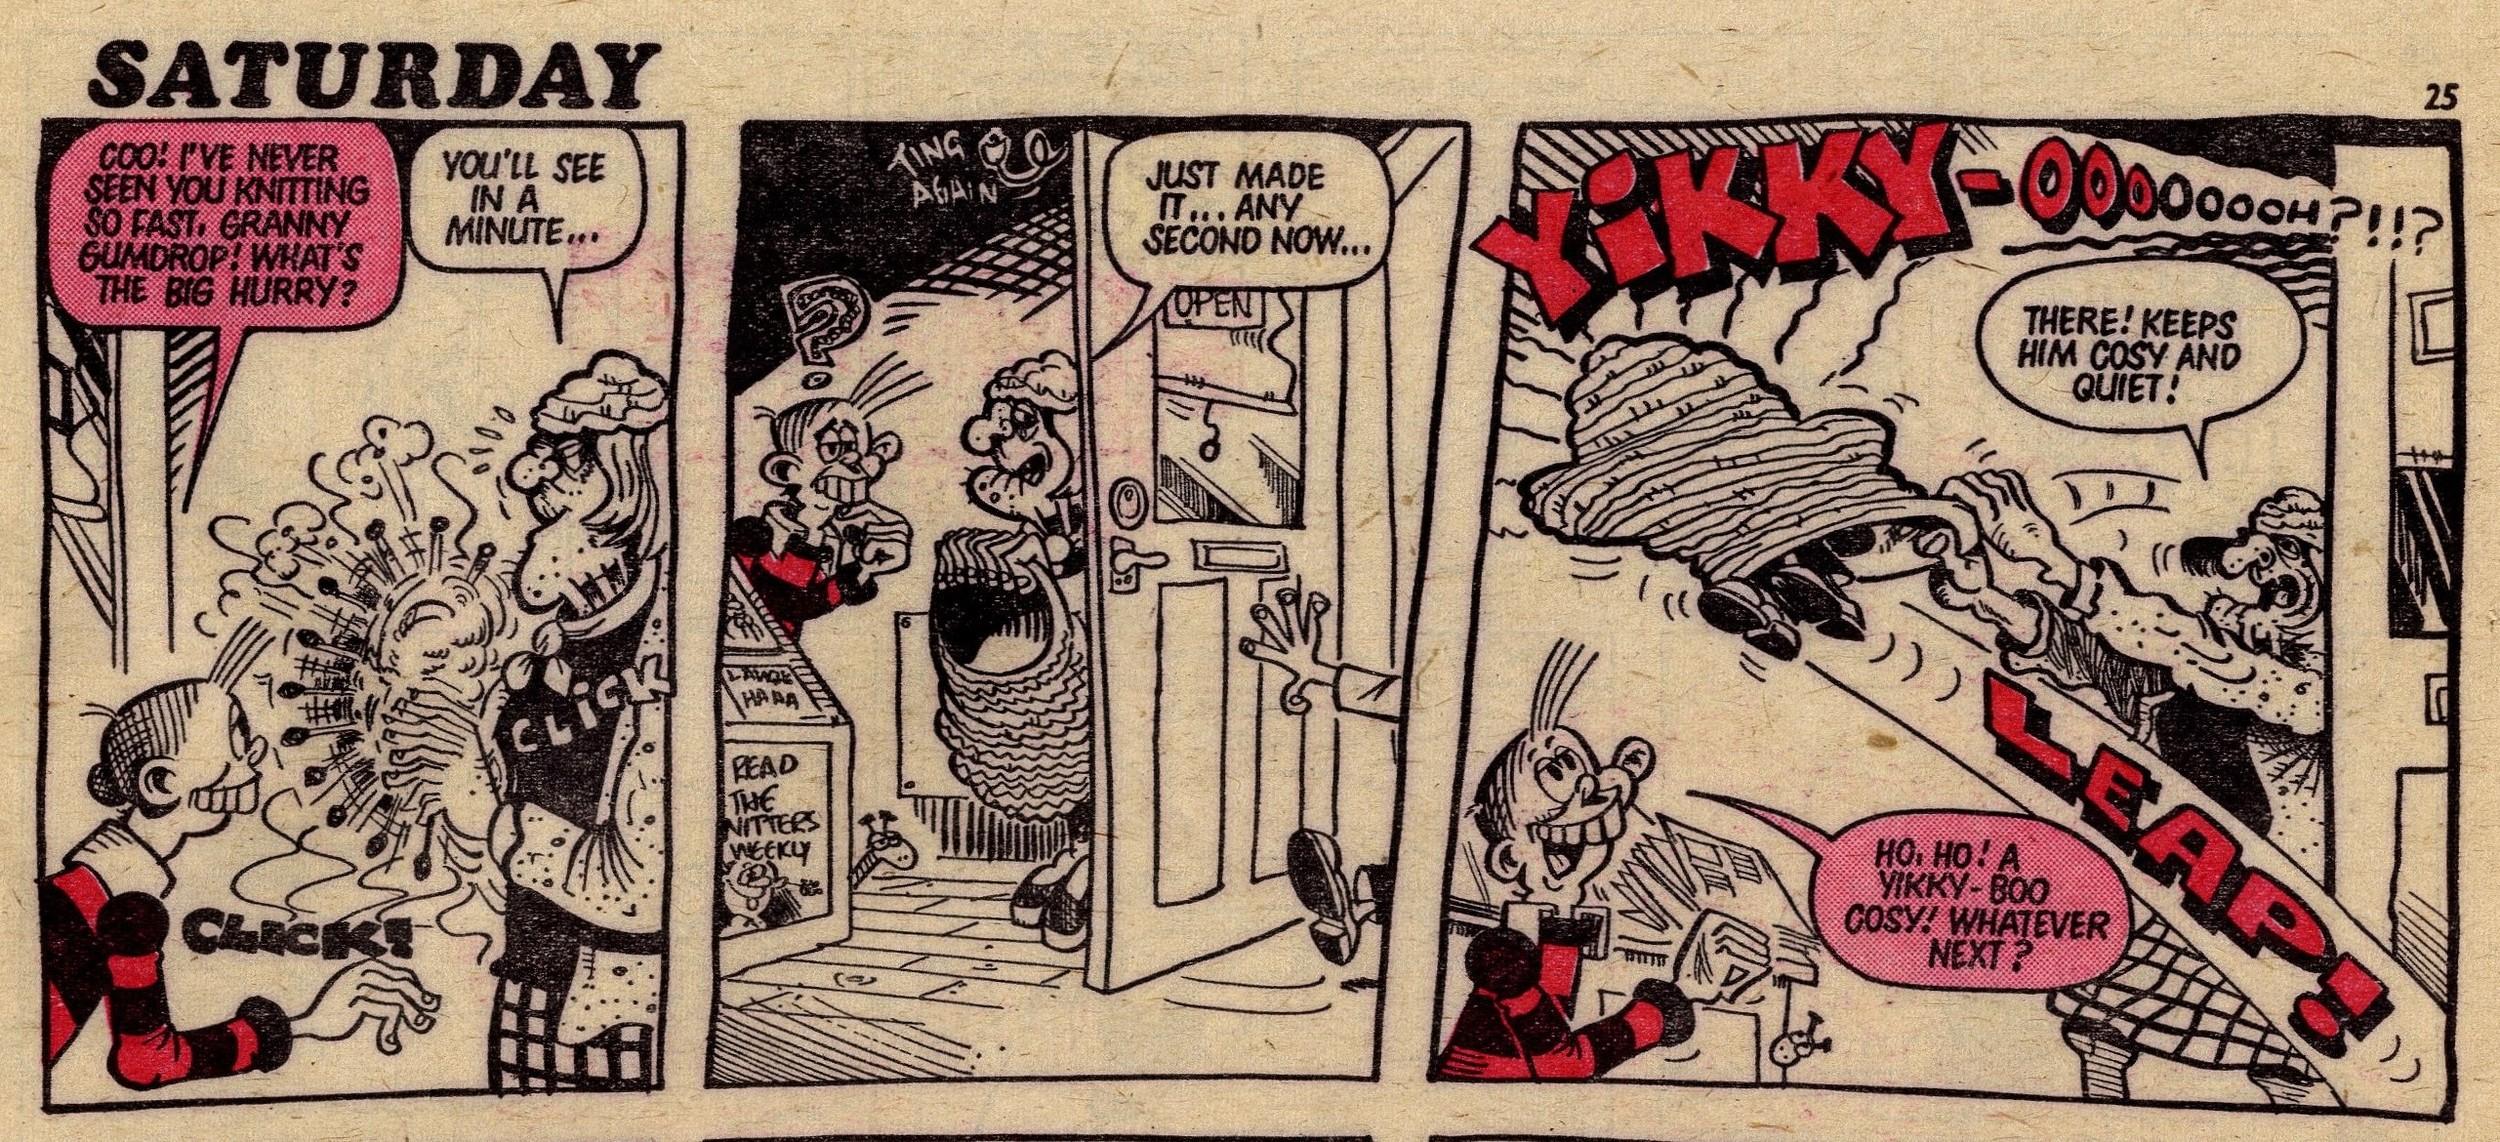 Cheeky's Week: Saturday: Jim Watson (artist)